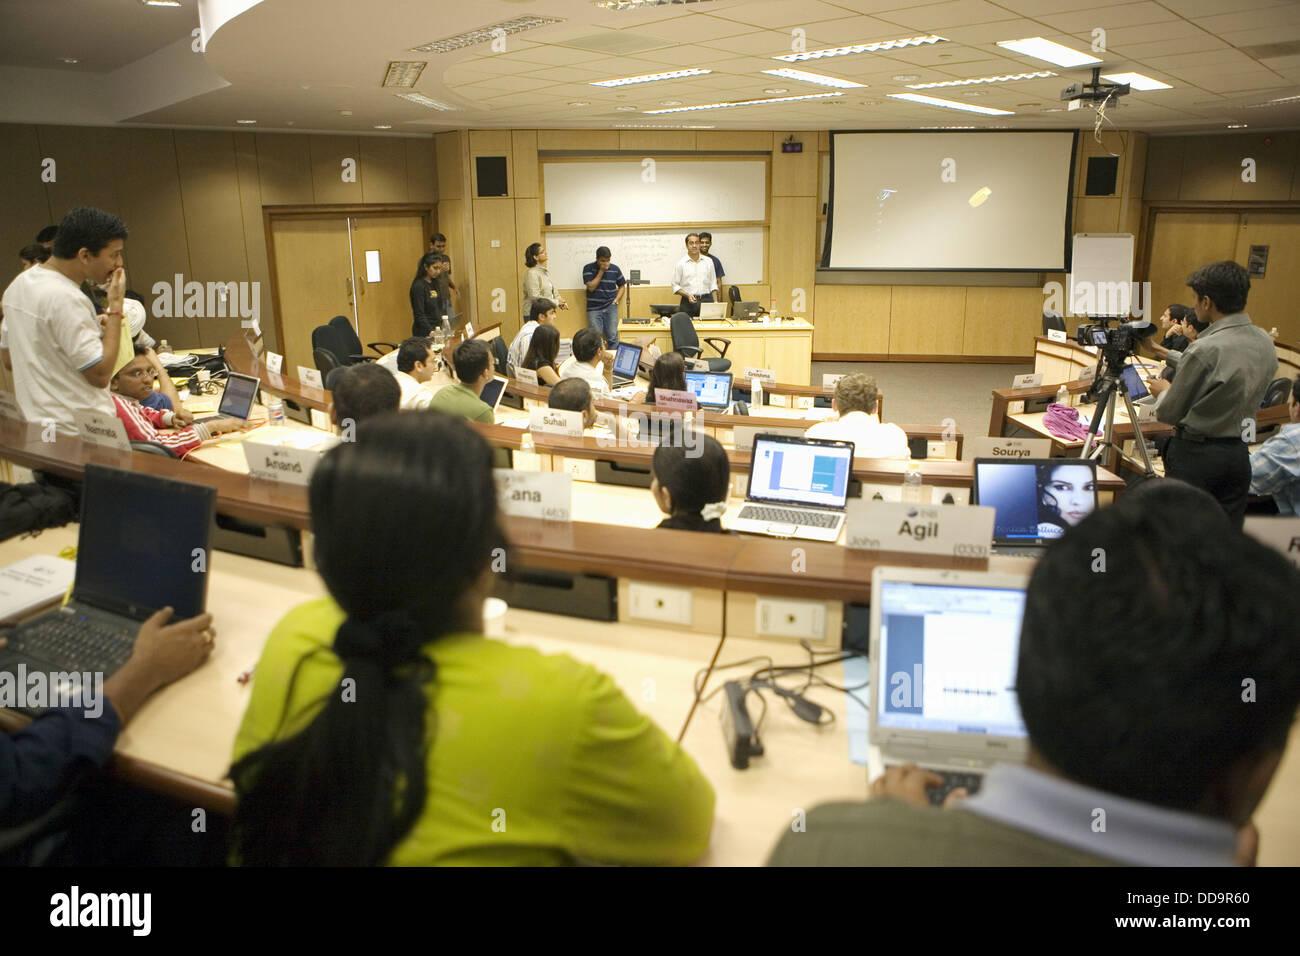 India  Hyderabad  Hi - Tech City  Indian School of Business Stock